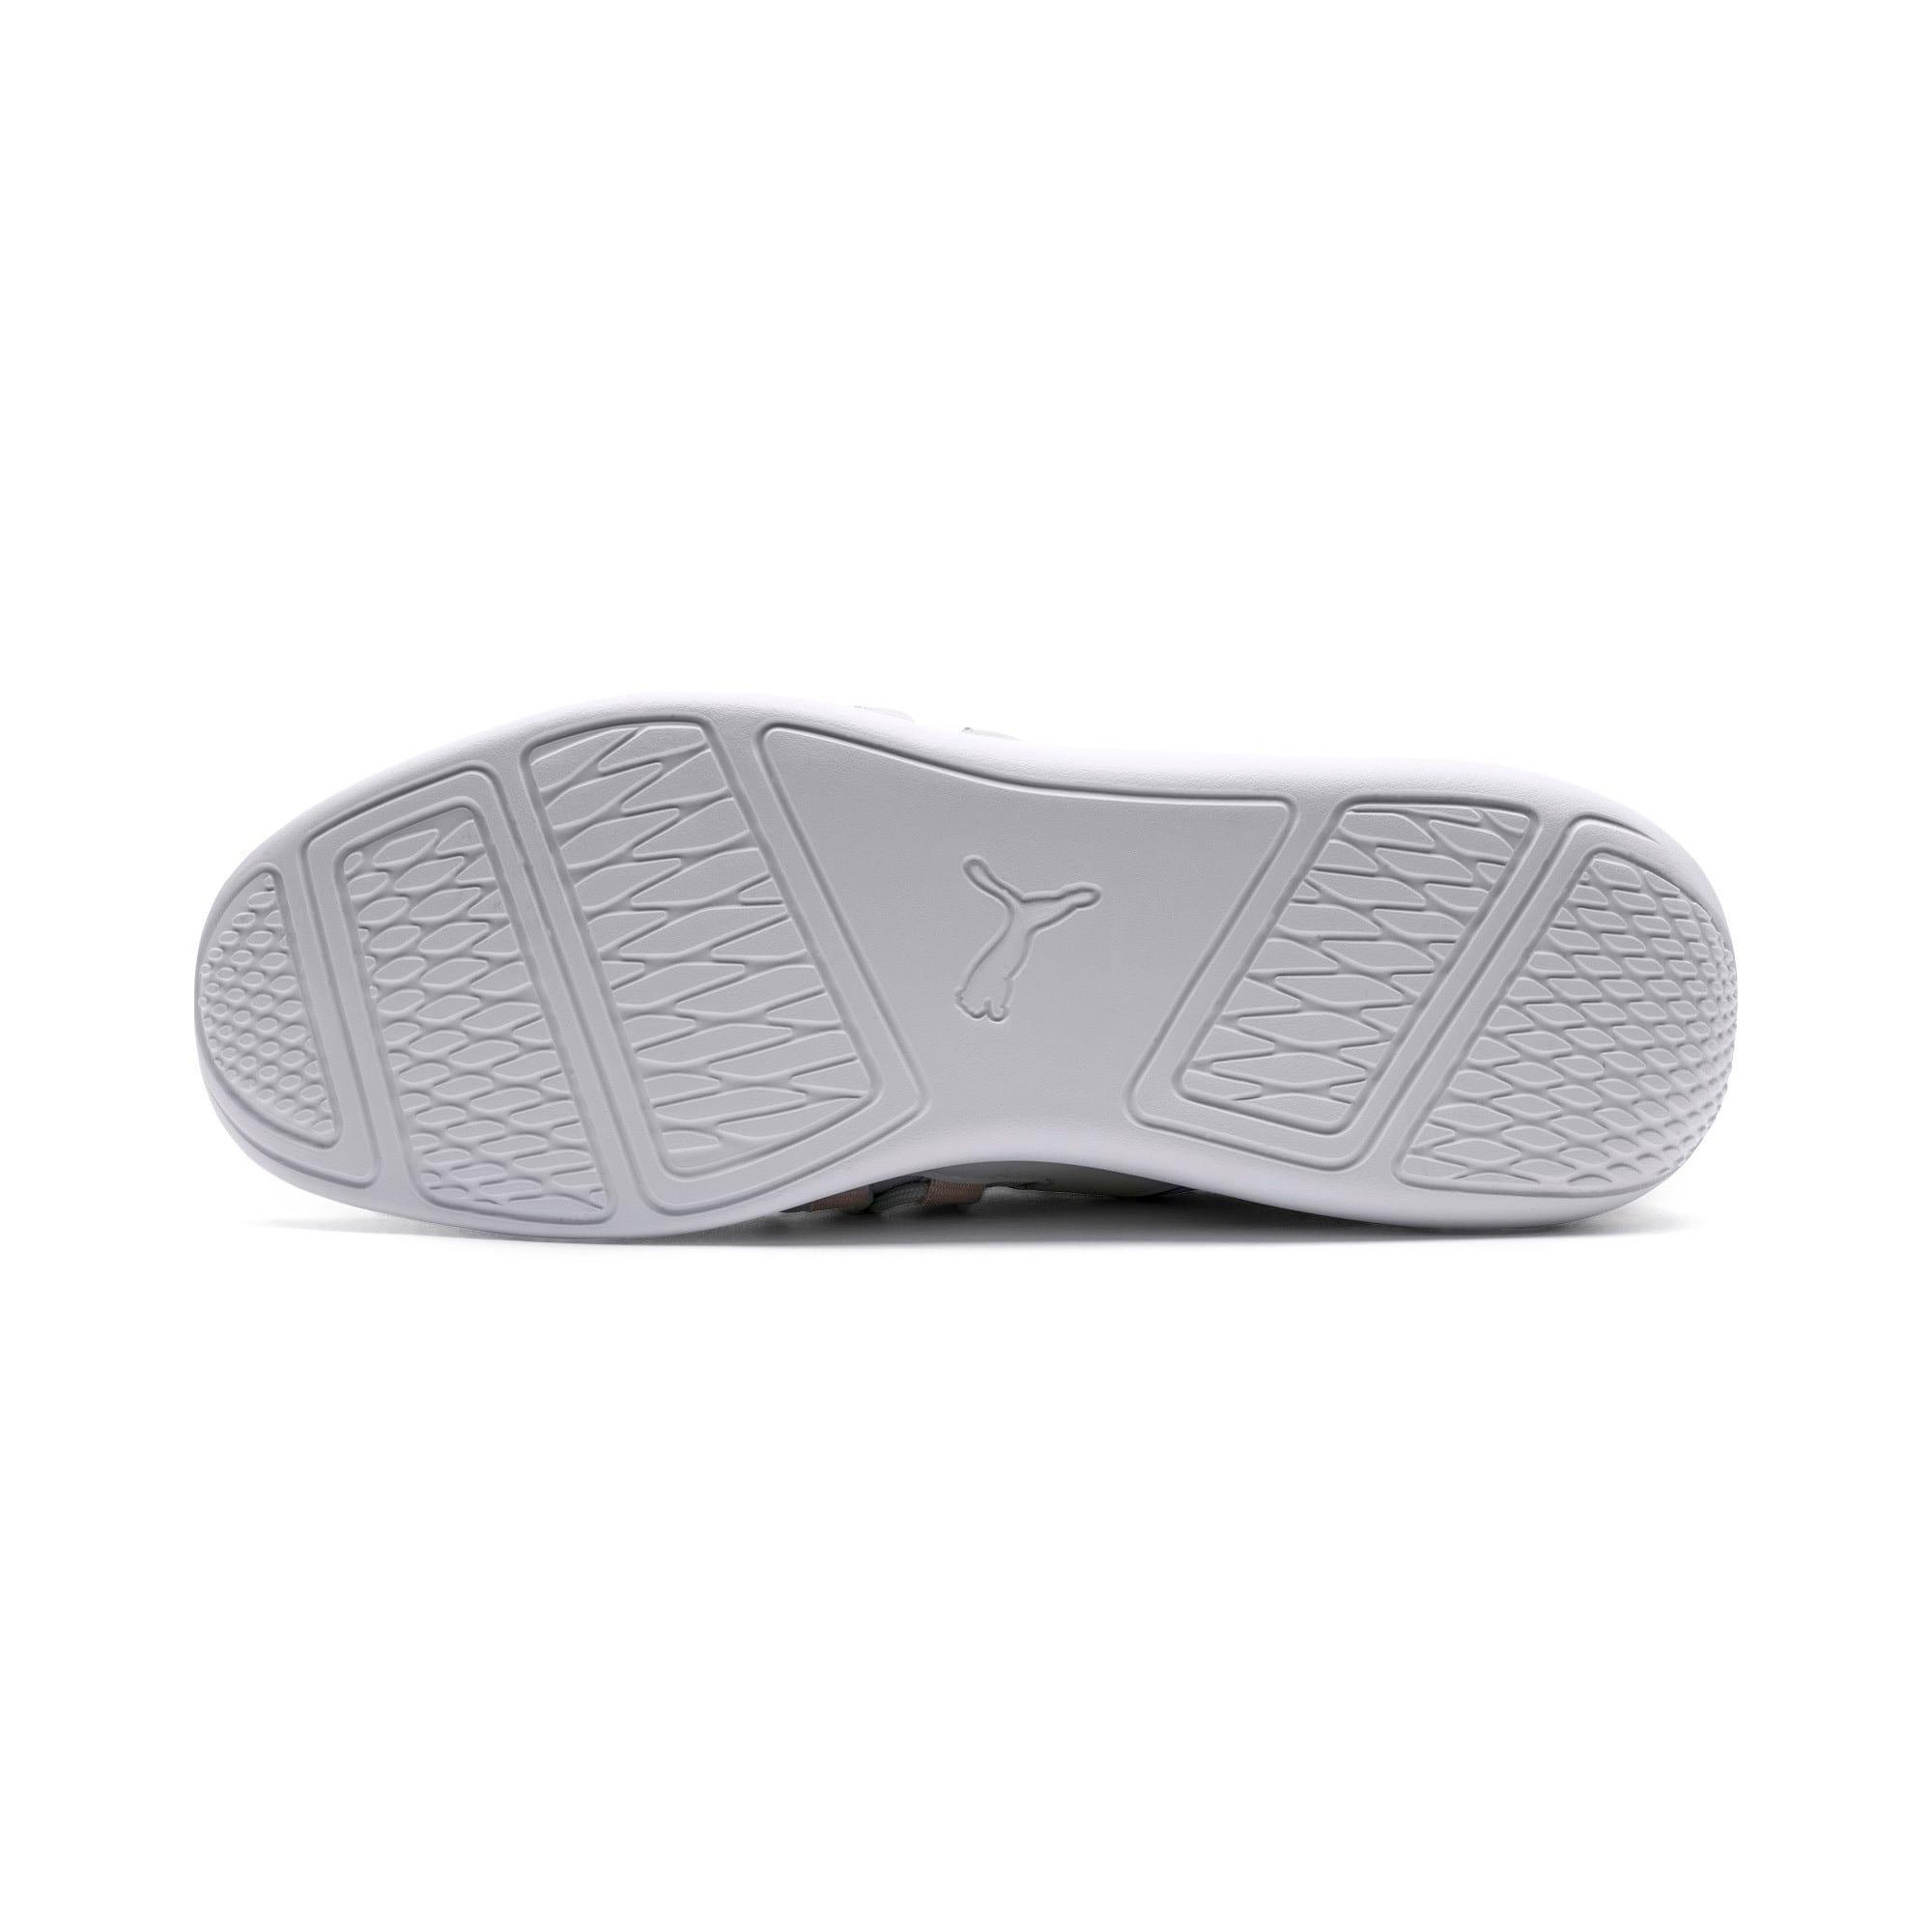 Thumbnail 3 of Evo Cat Sock Lace Monaco Women's Sneakers, GrayViolet-MahoganyRose-Wht, medium